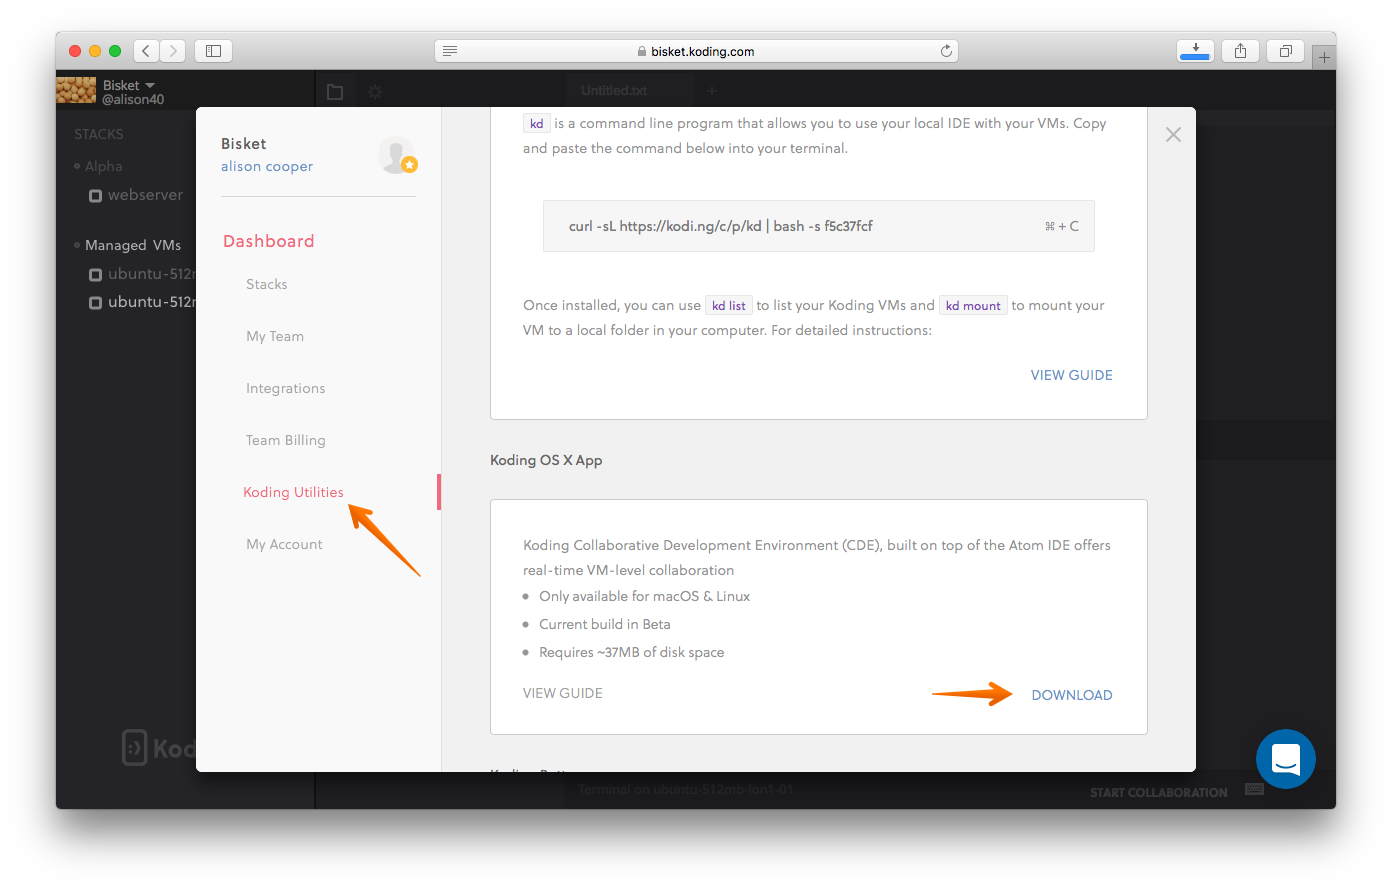 Download Koding OS X App